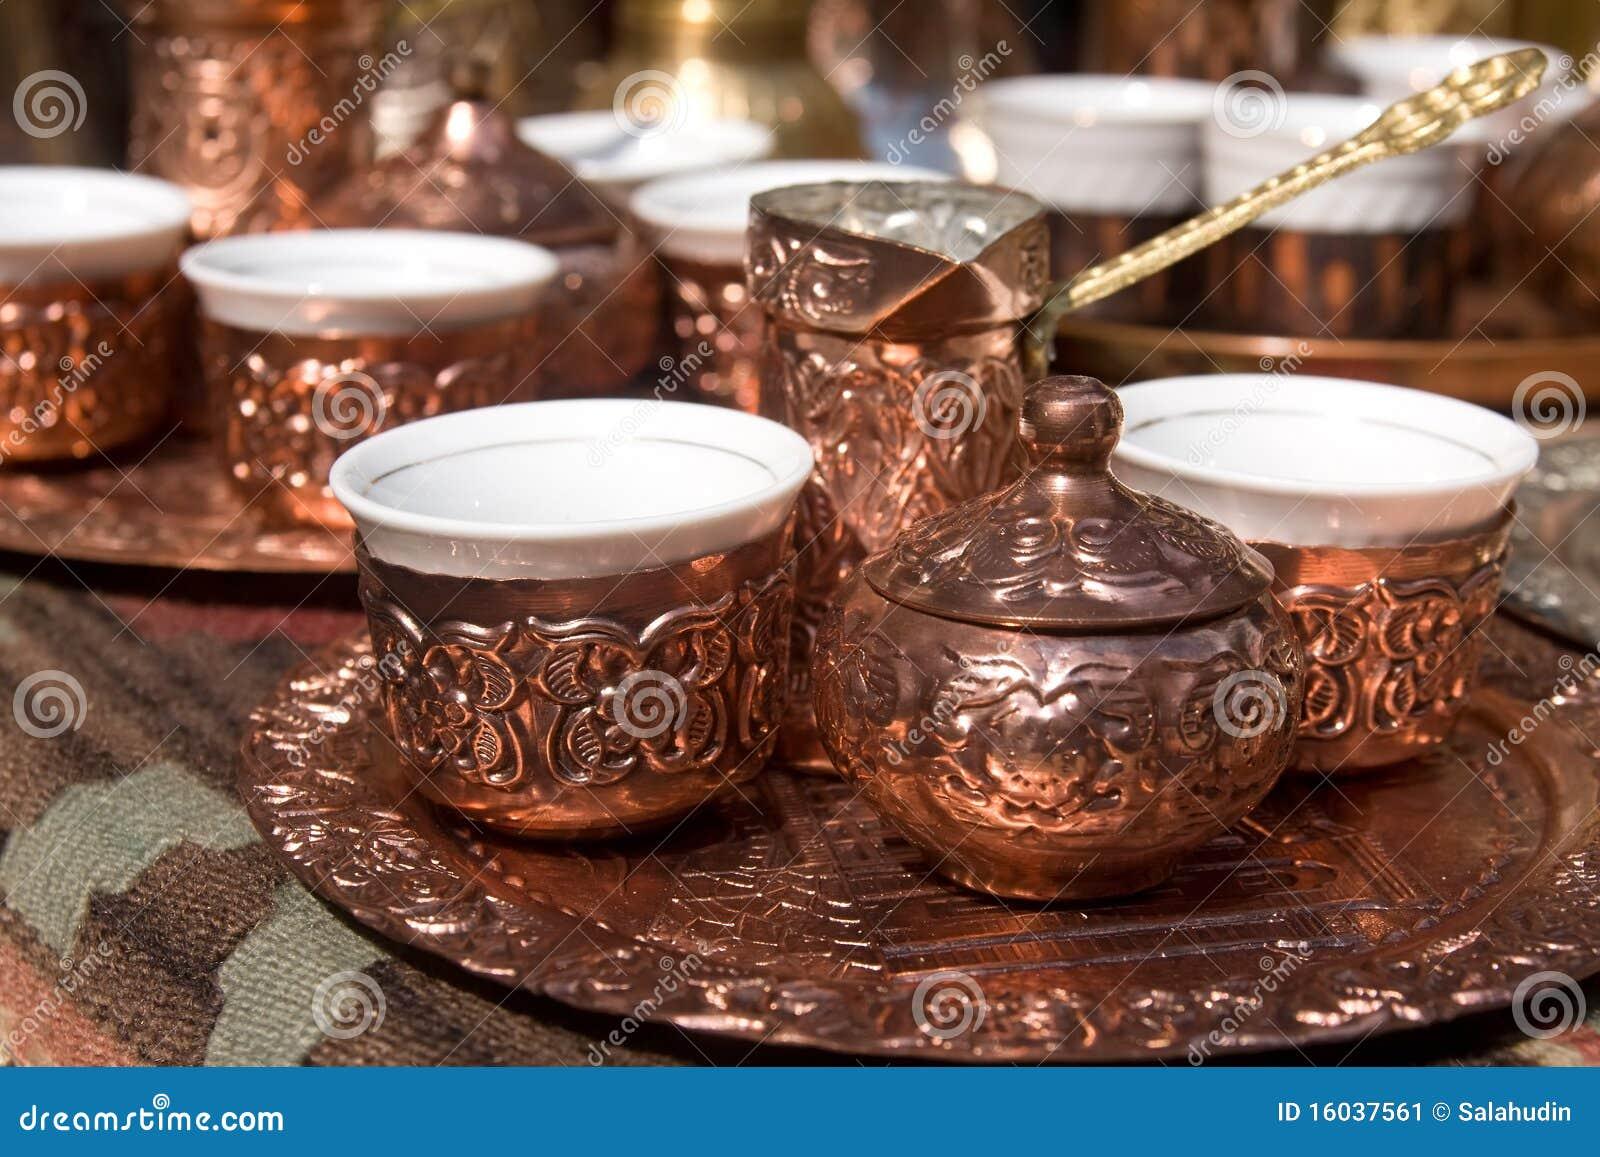 bosnian-turkish-coffee-set-16037561.jpg